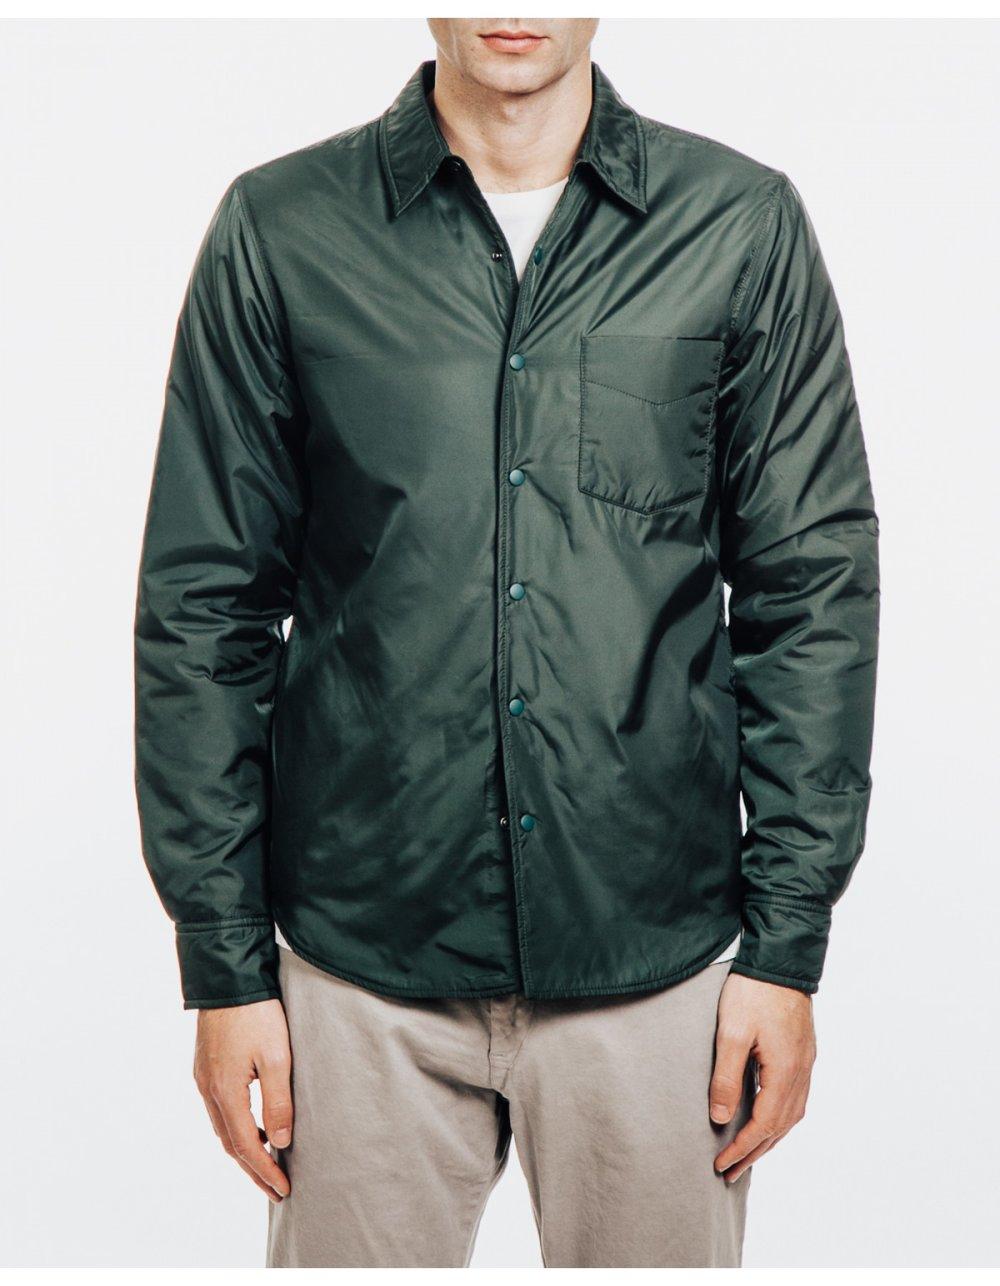 aspesi-marvin-shirt-jacket-dark-green-1.jpg